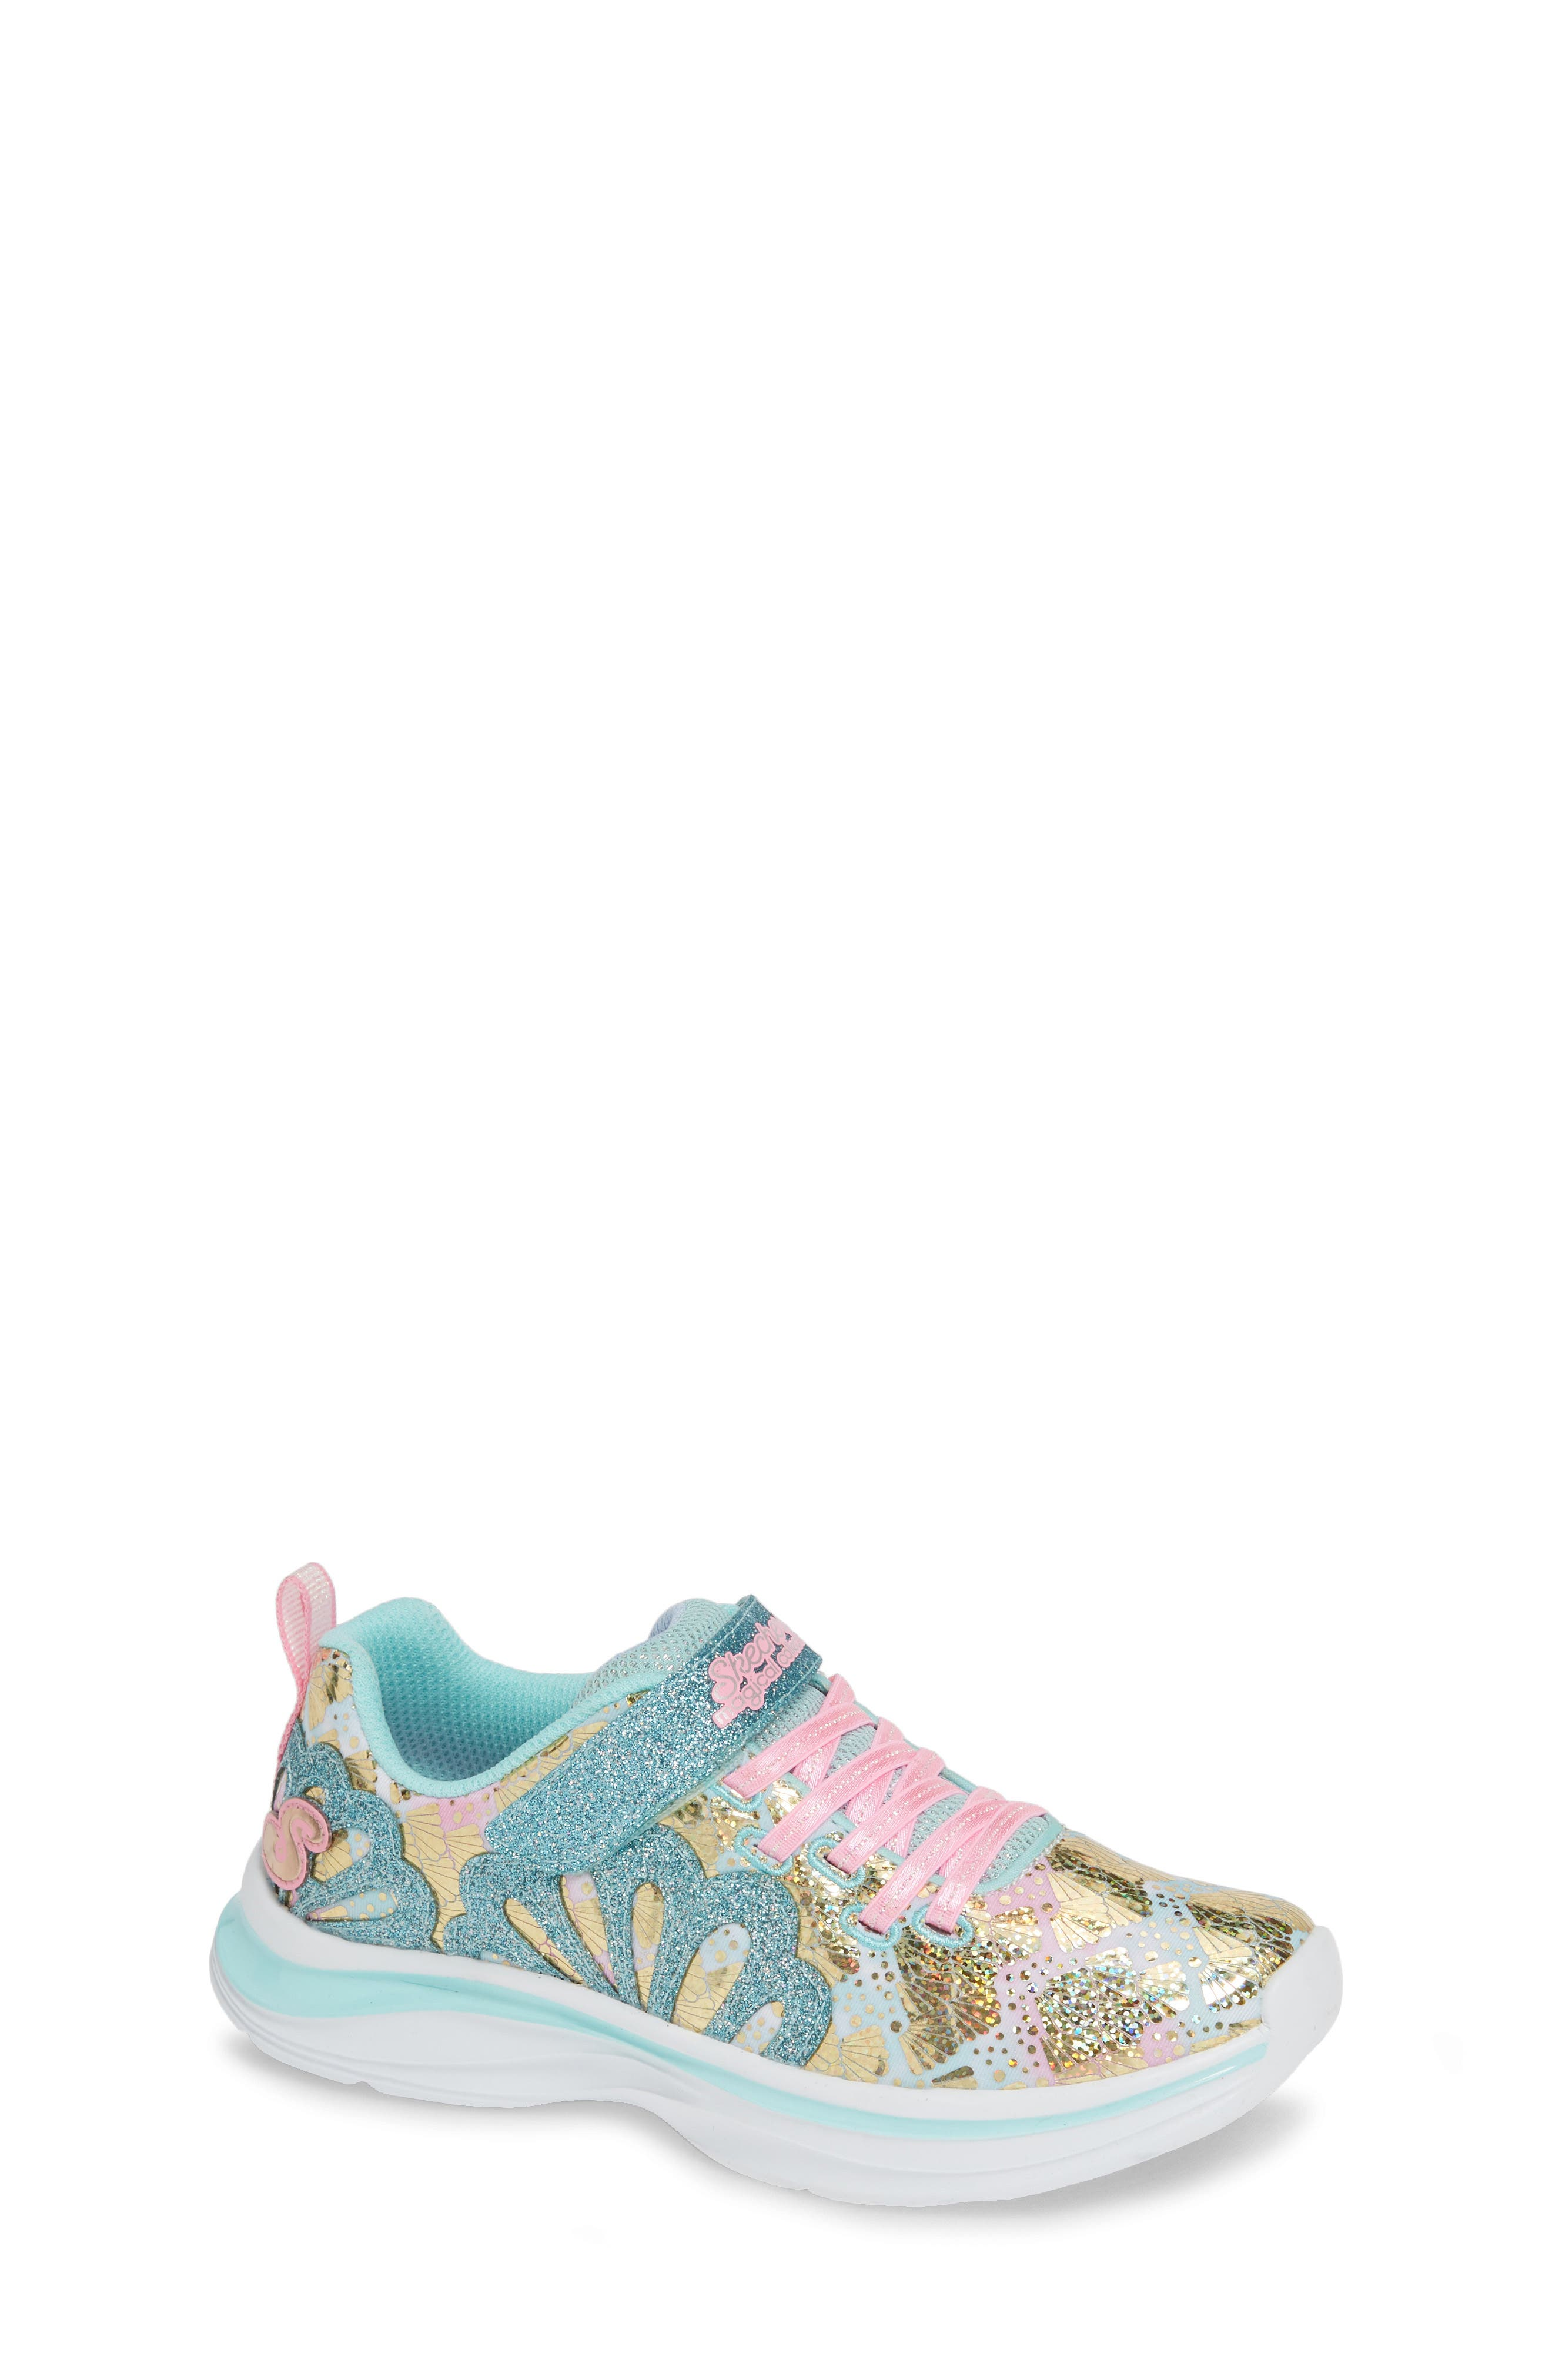 SKECHERS, Double Dreams Shimmer Sneaker, Main thumbnail 1, color, AQUA/ PINK TEXTILE